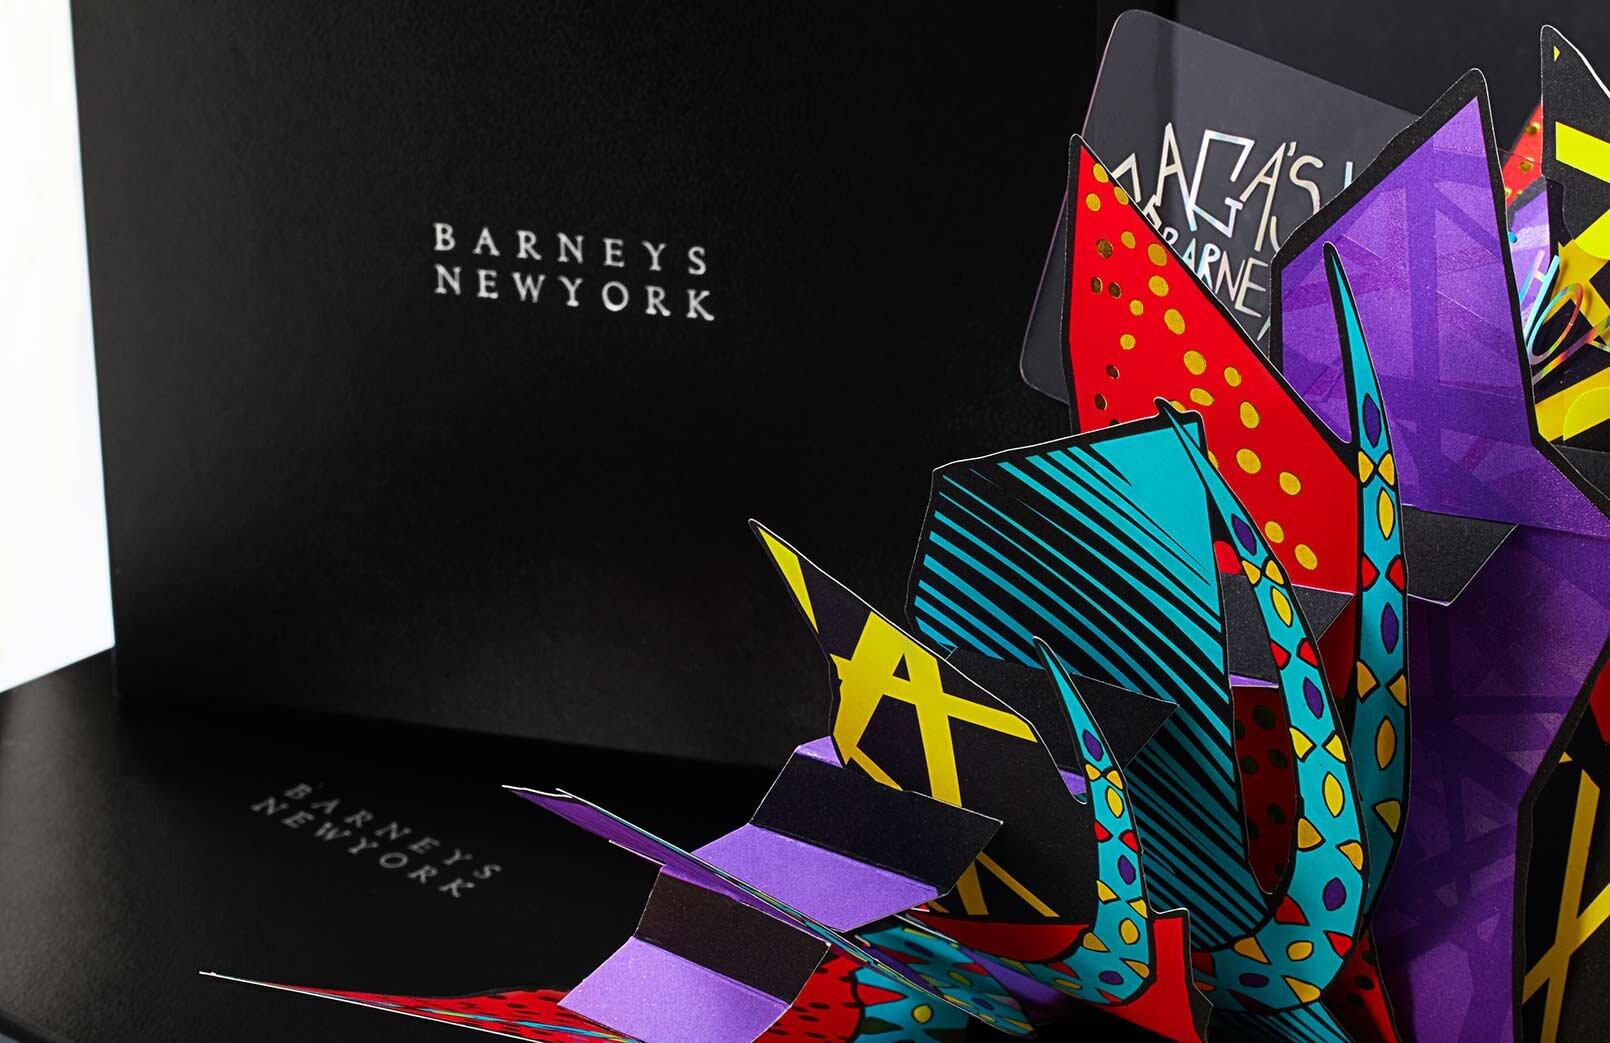 Barneys-New-York-Holiday-Lady-Gaga-Worskshop-Design-Packaging Company-3.JPG